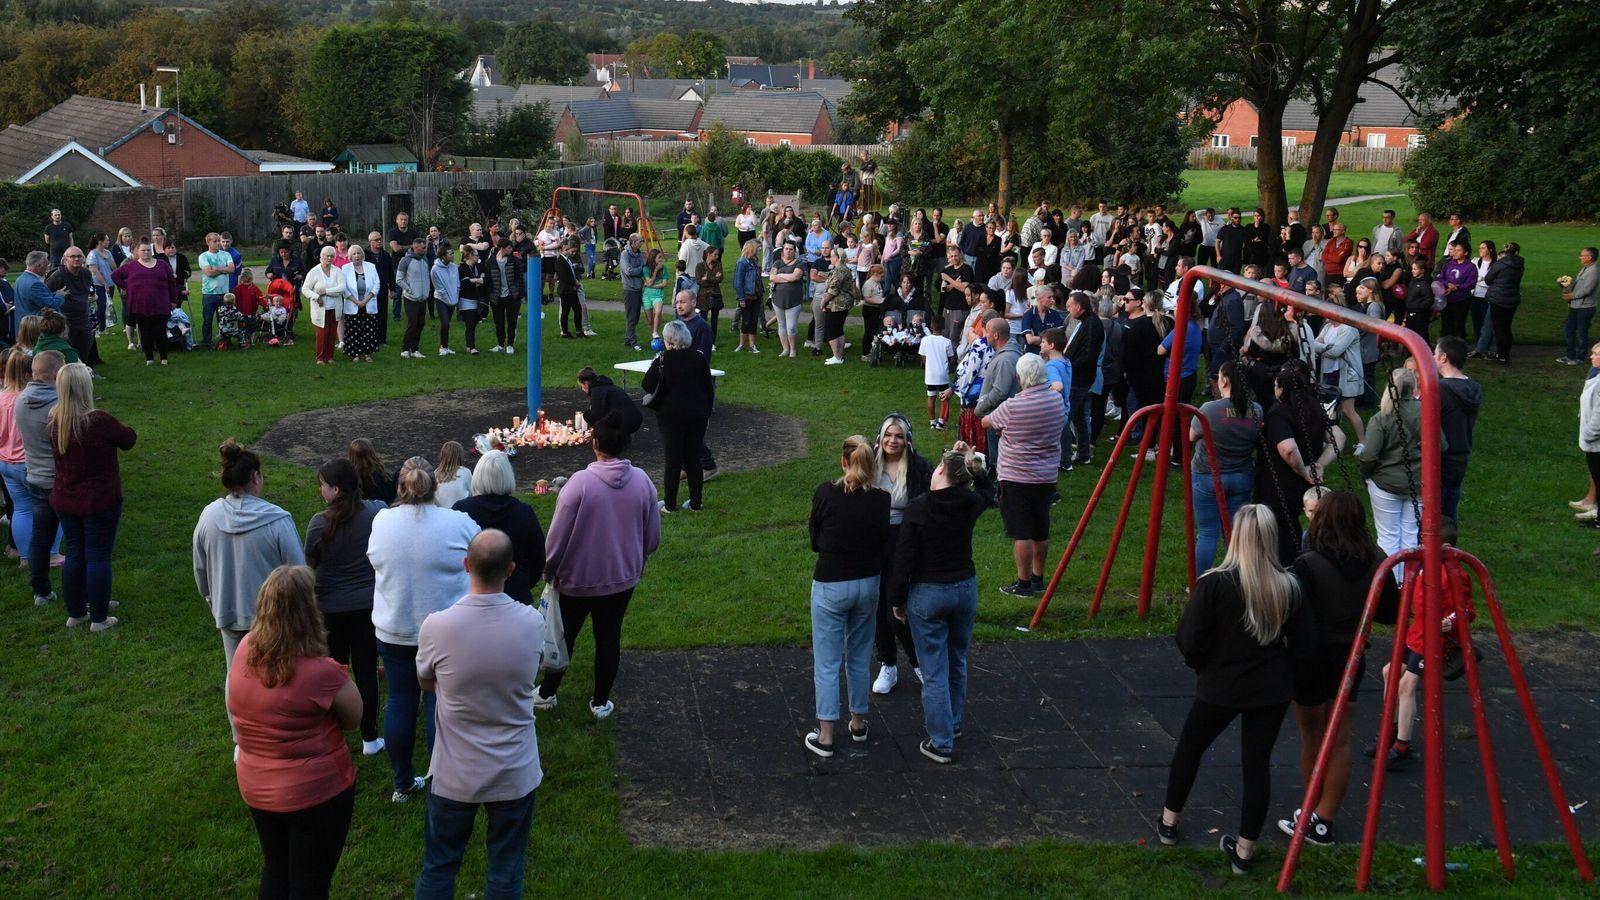 Derbyshire deaths: Hundreds attend vigil after mum, two children, and friend 'on a sleepover' found dead